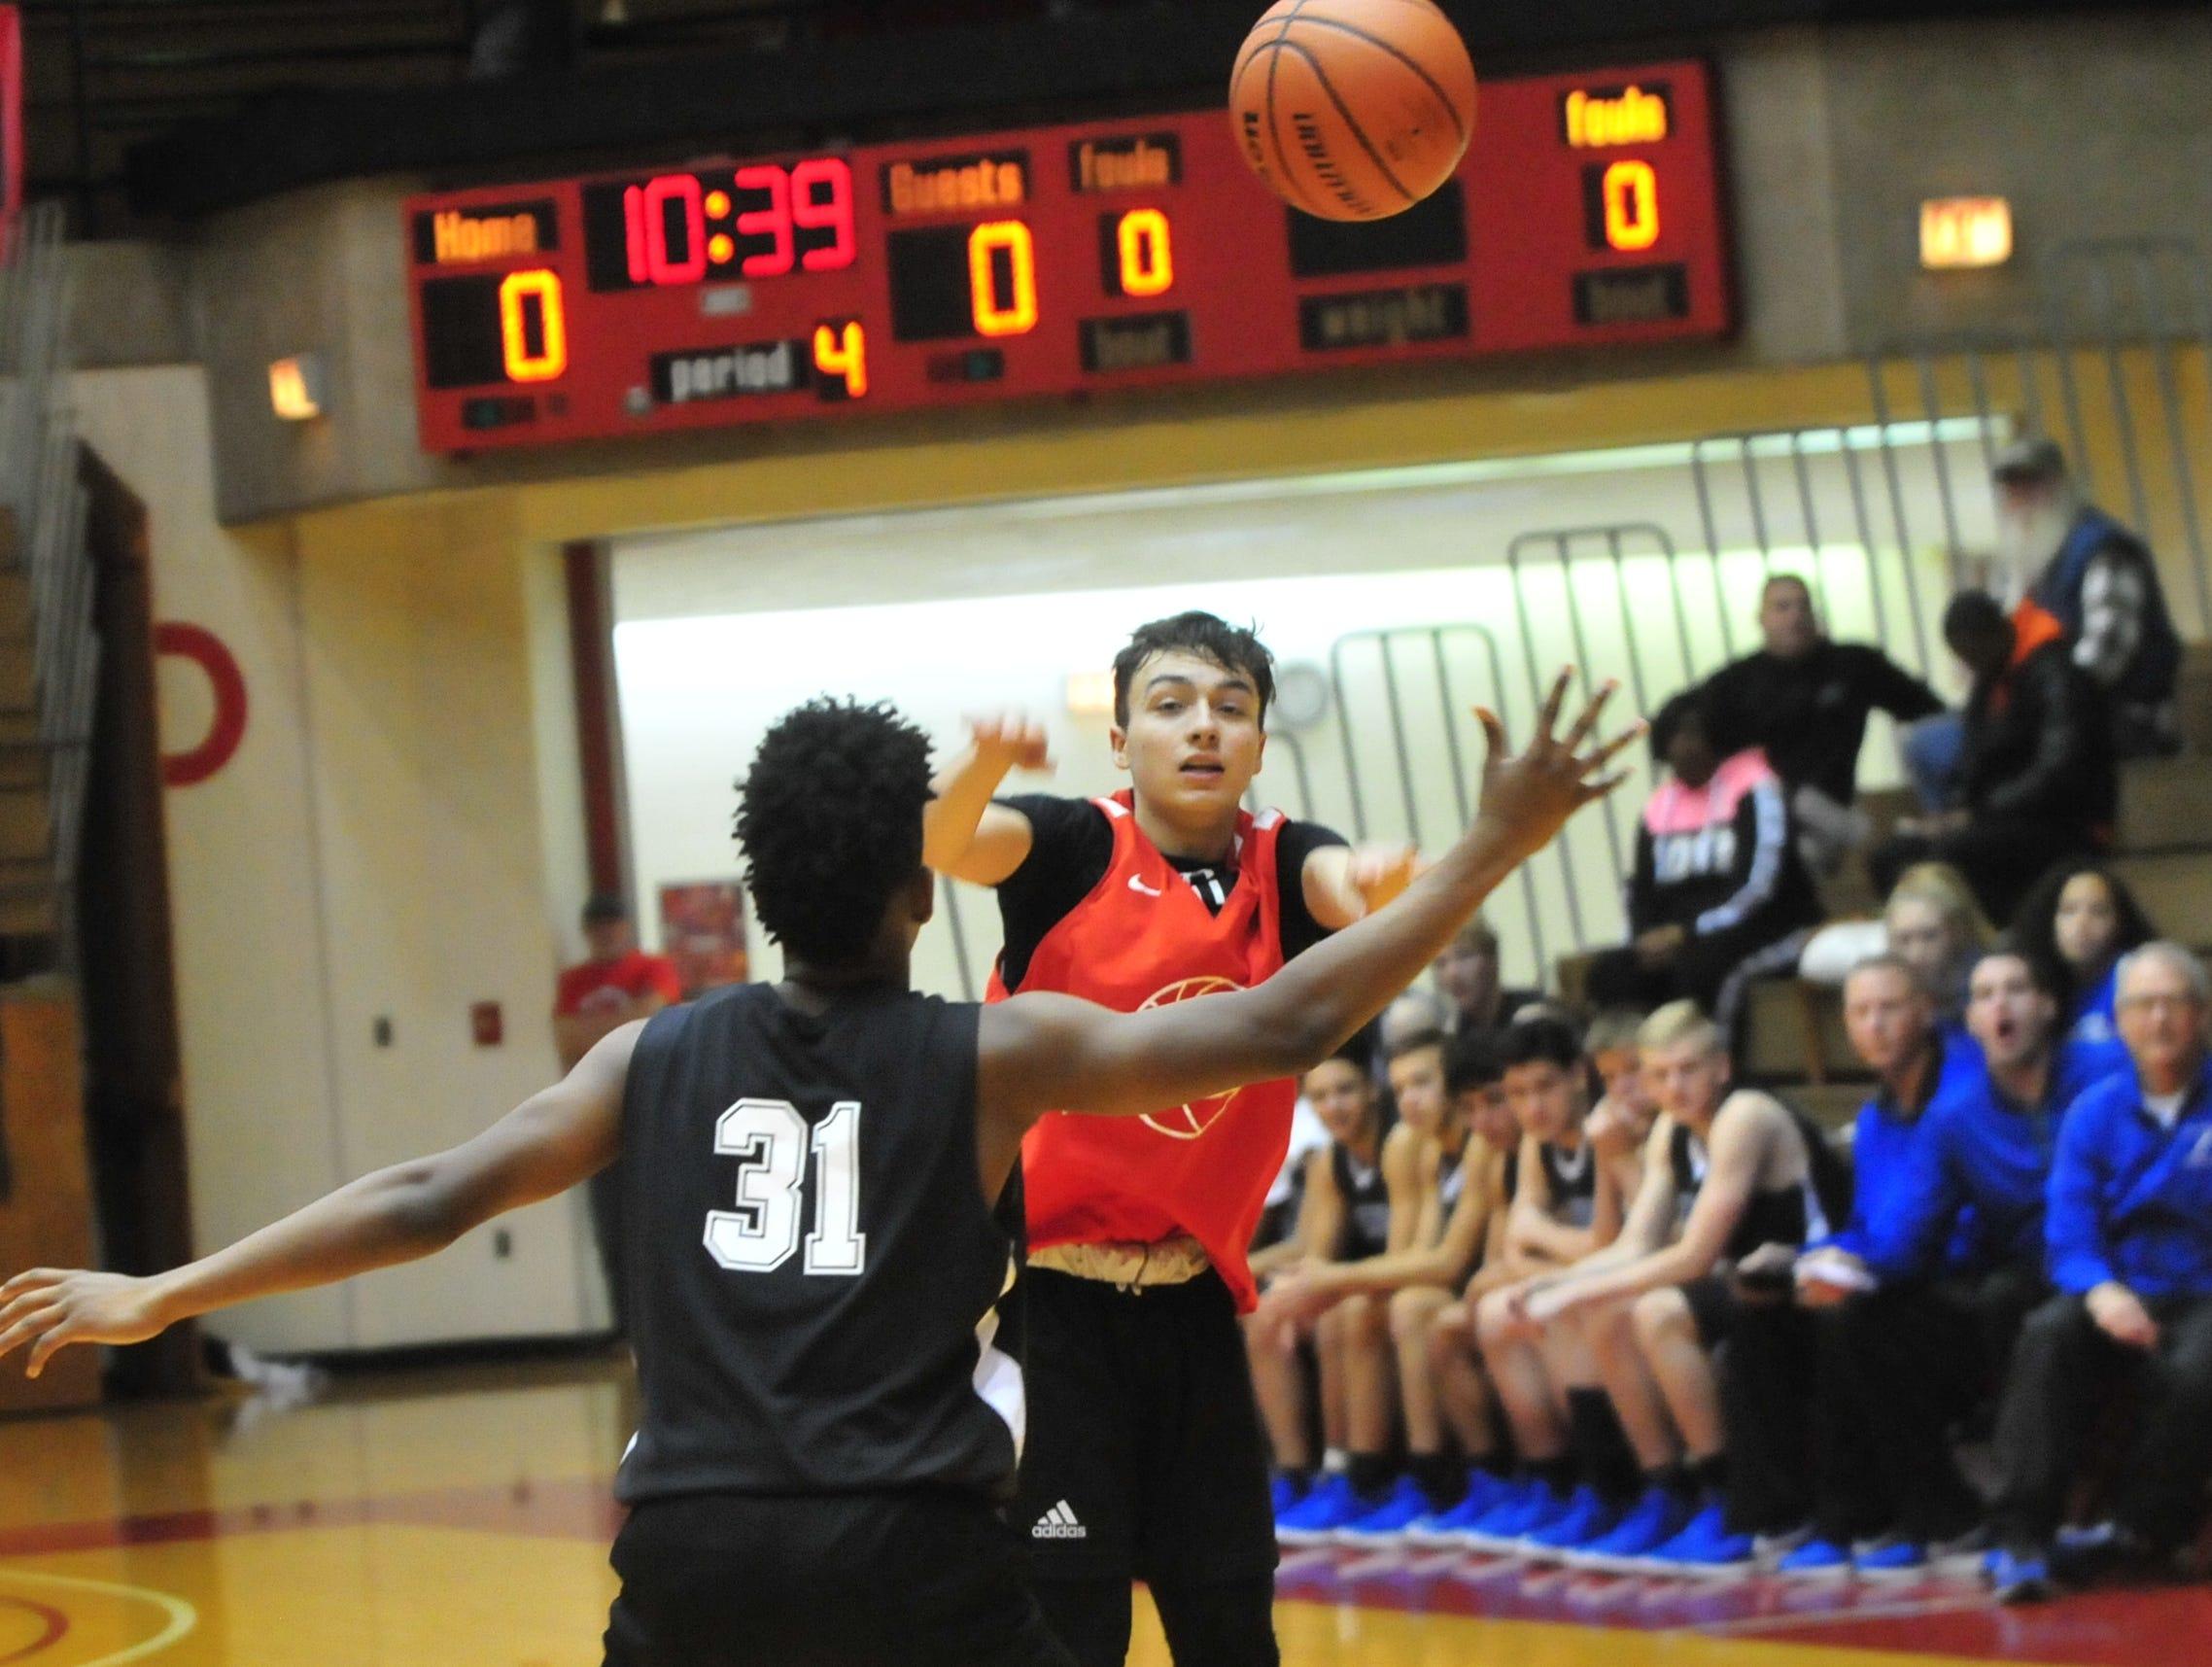 Richmond High School senior Jalen Hillard makes a pass during a boys basketball scrimmage against Franklin Central Saturday, Nov. 17, 2018 at Richmond High School's Tiernan Center.